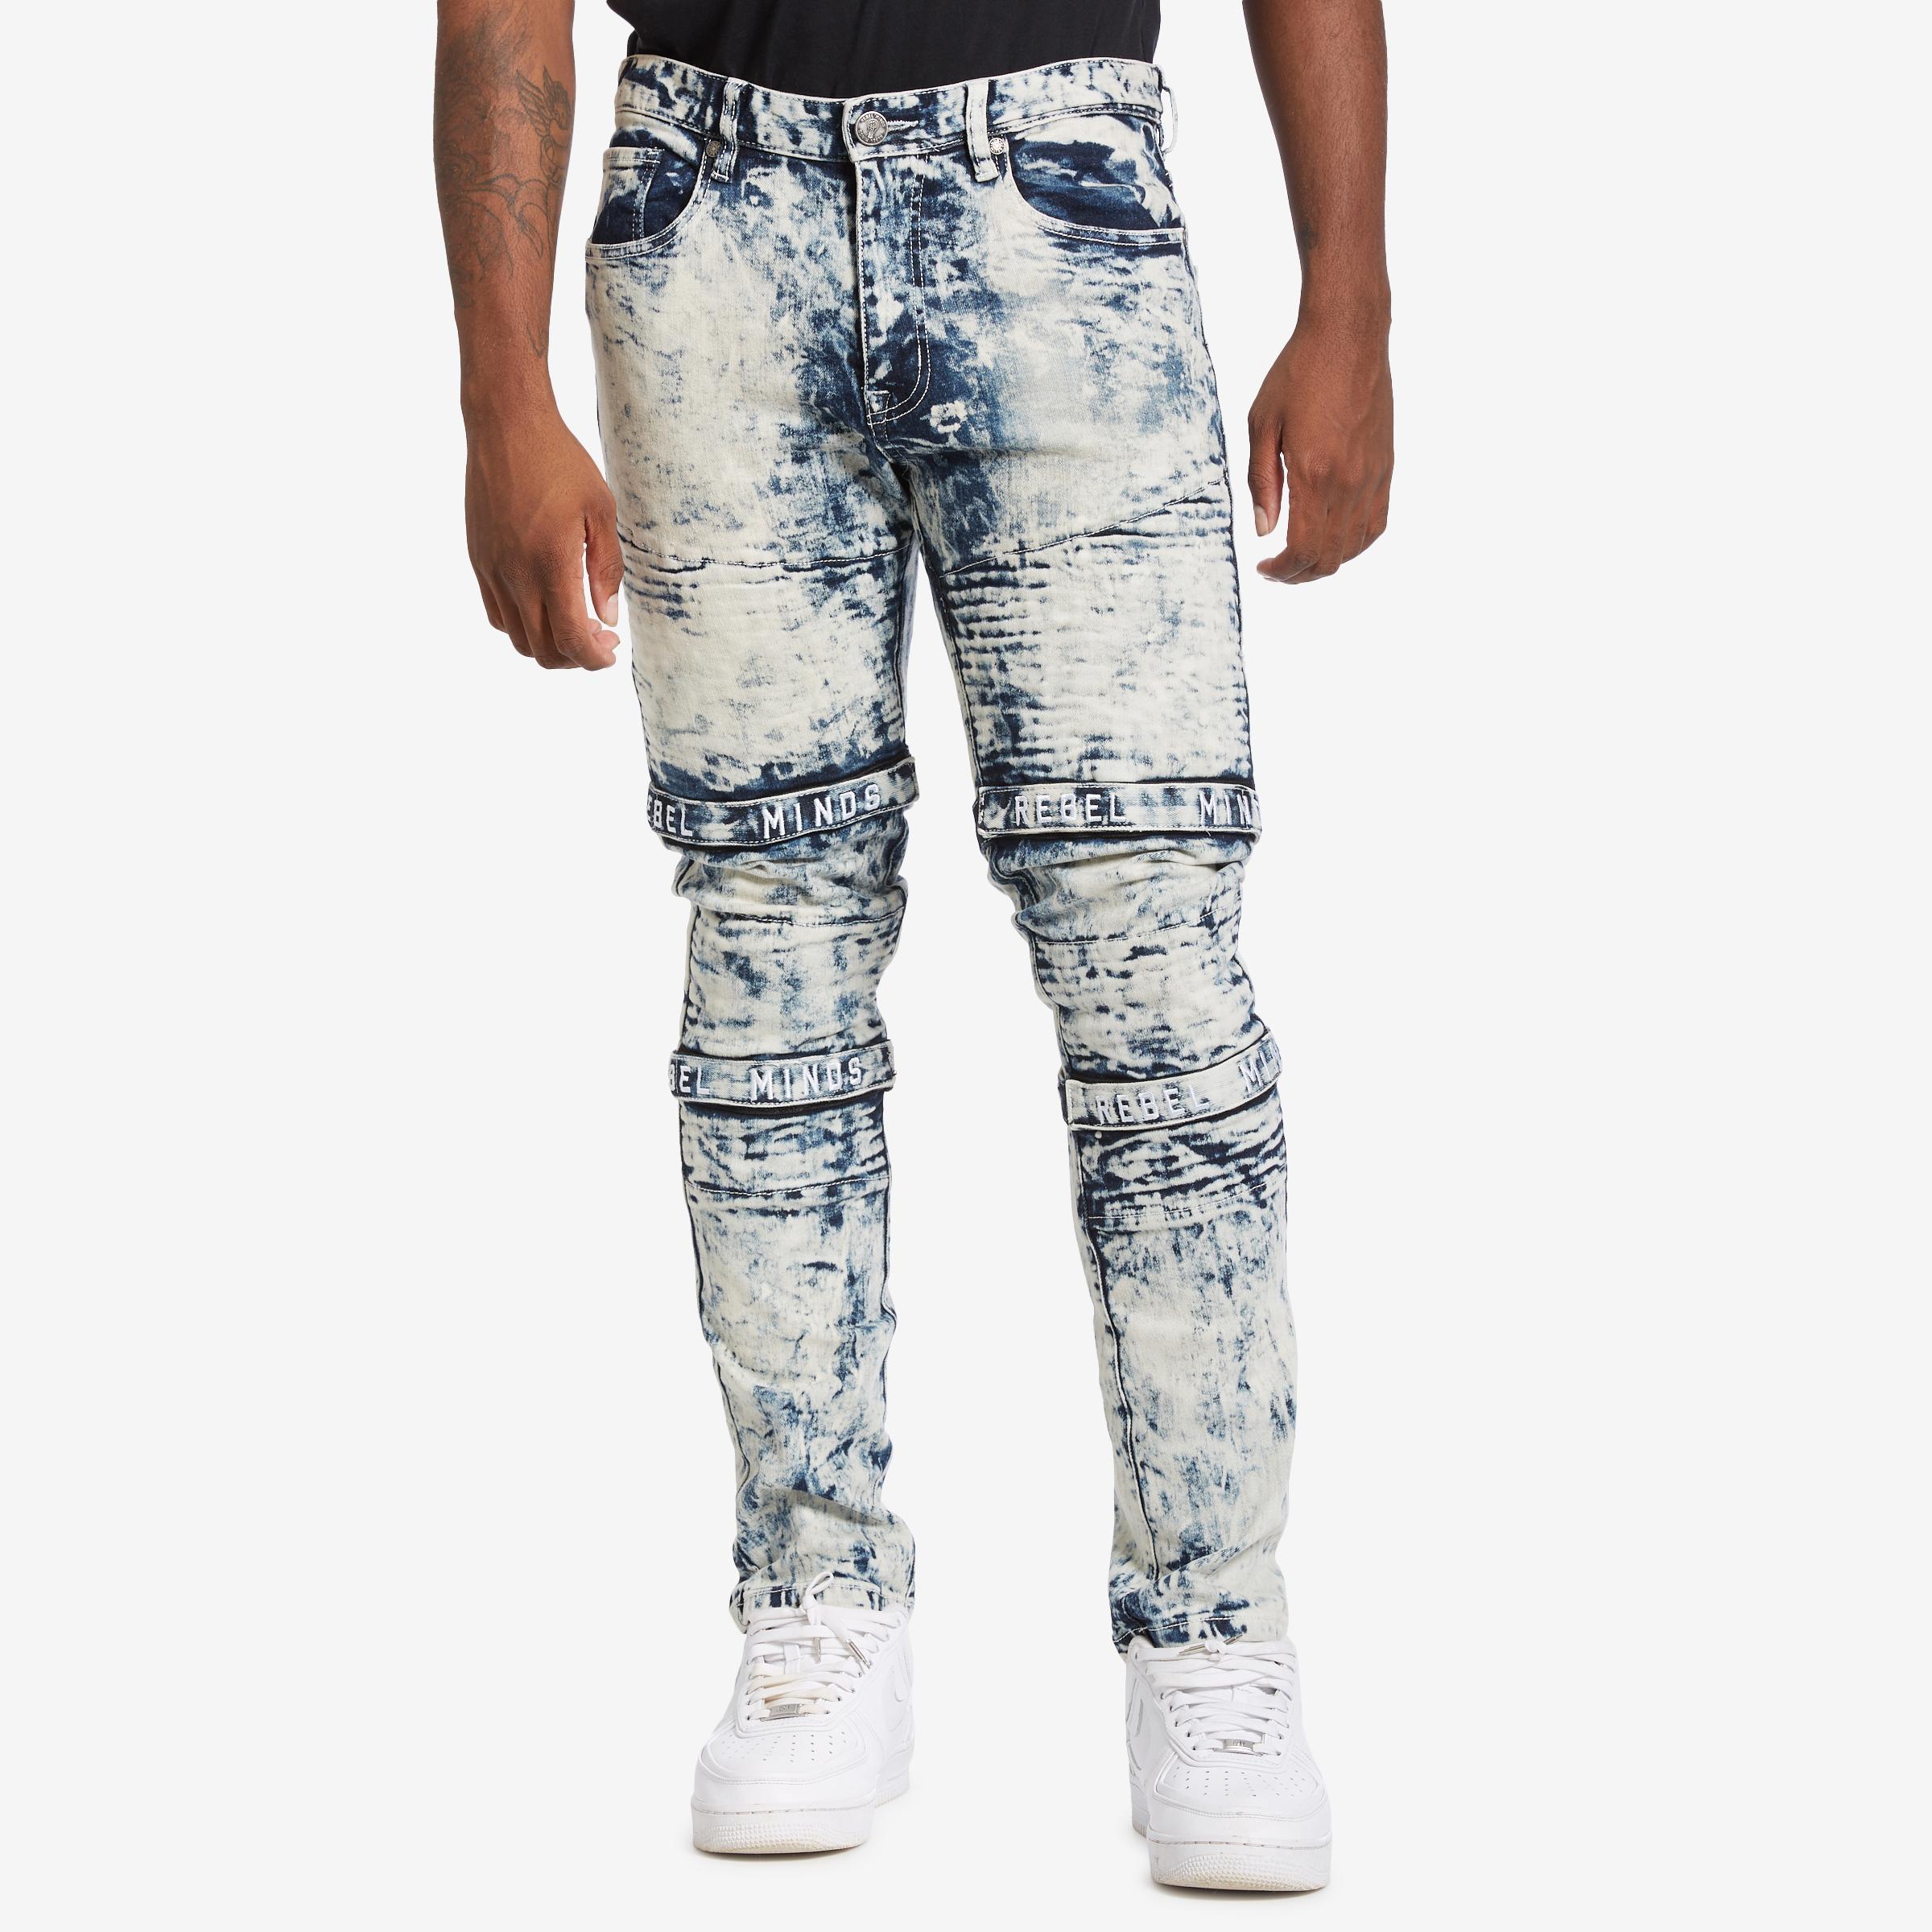 adidas pants rebel